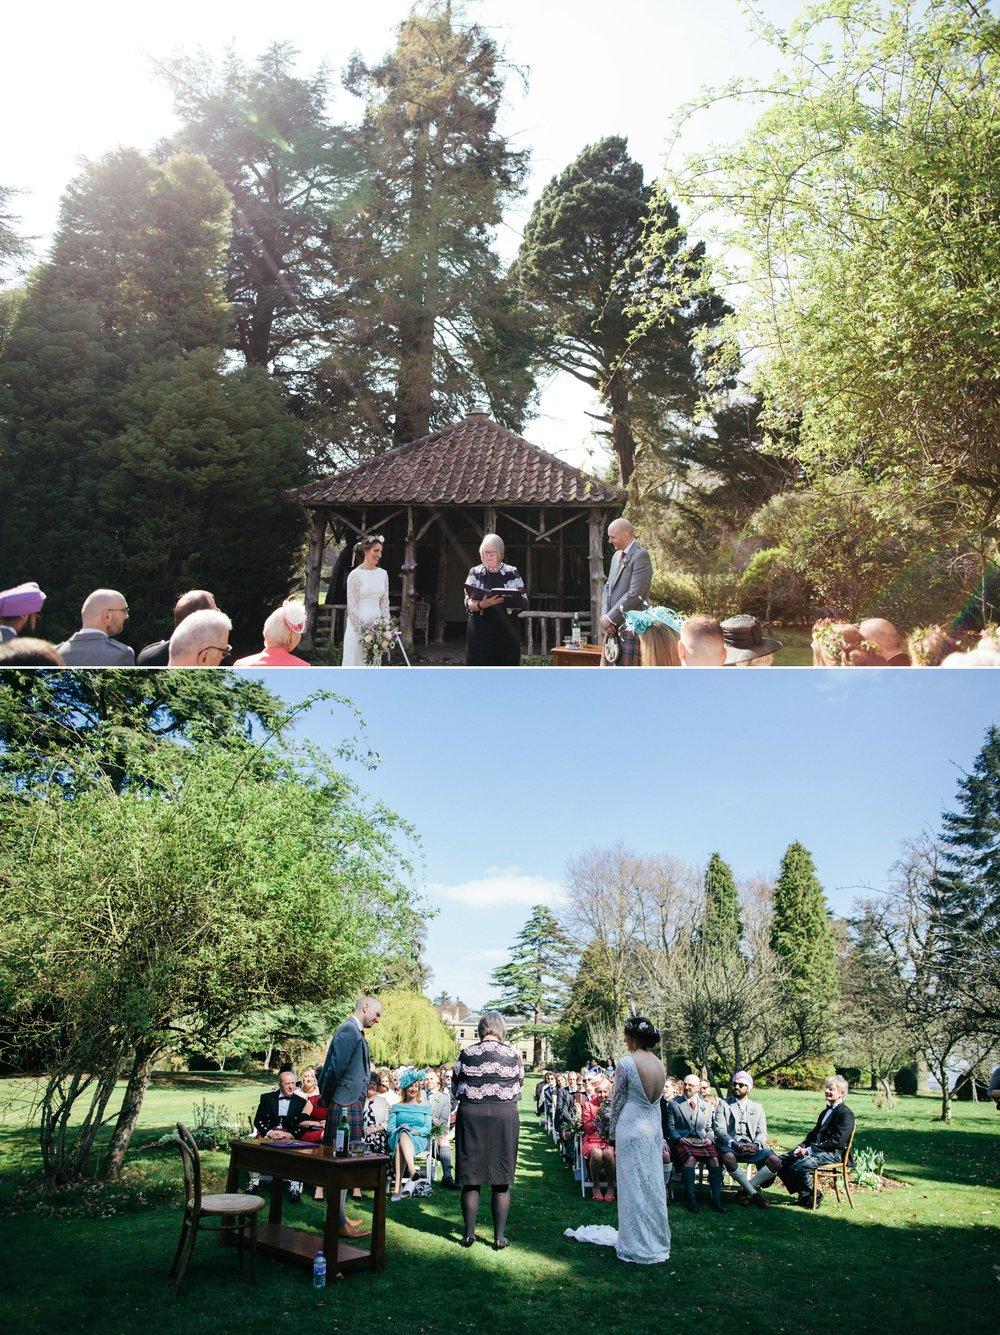 Mirrorbox - Errol Park - Springtime Outdoor Ceremony-38.jpg